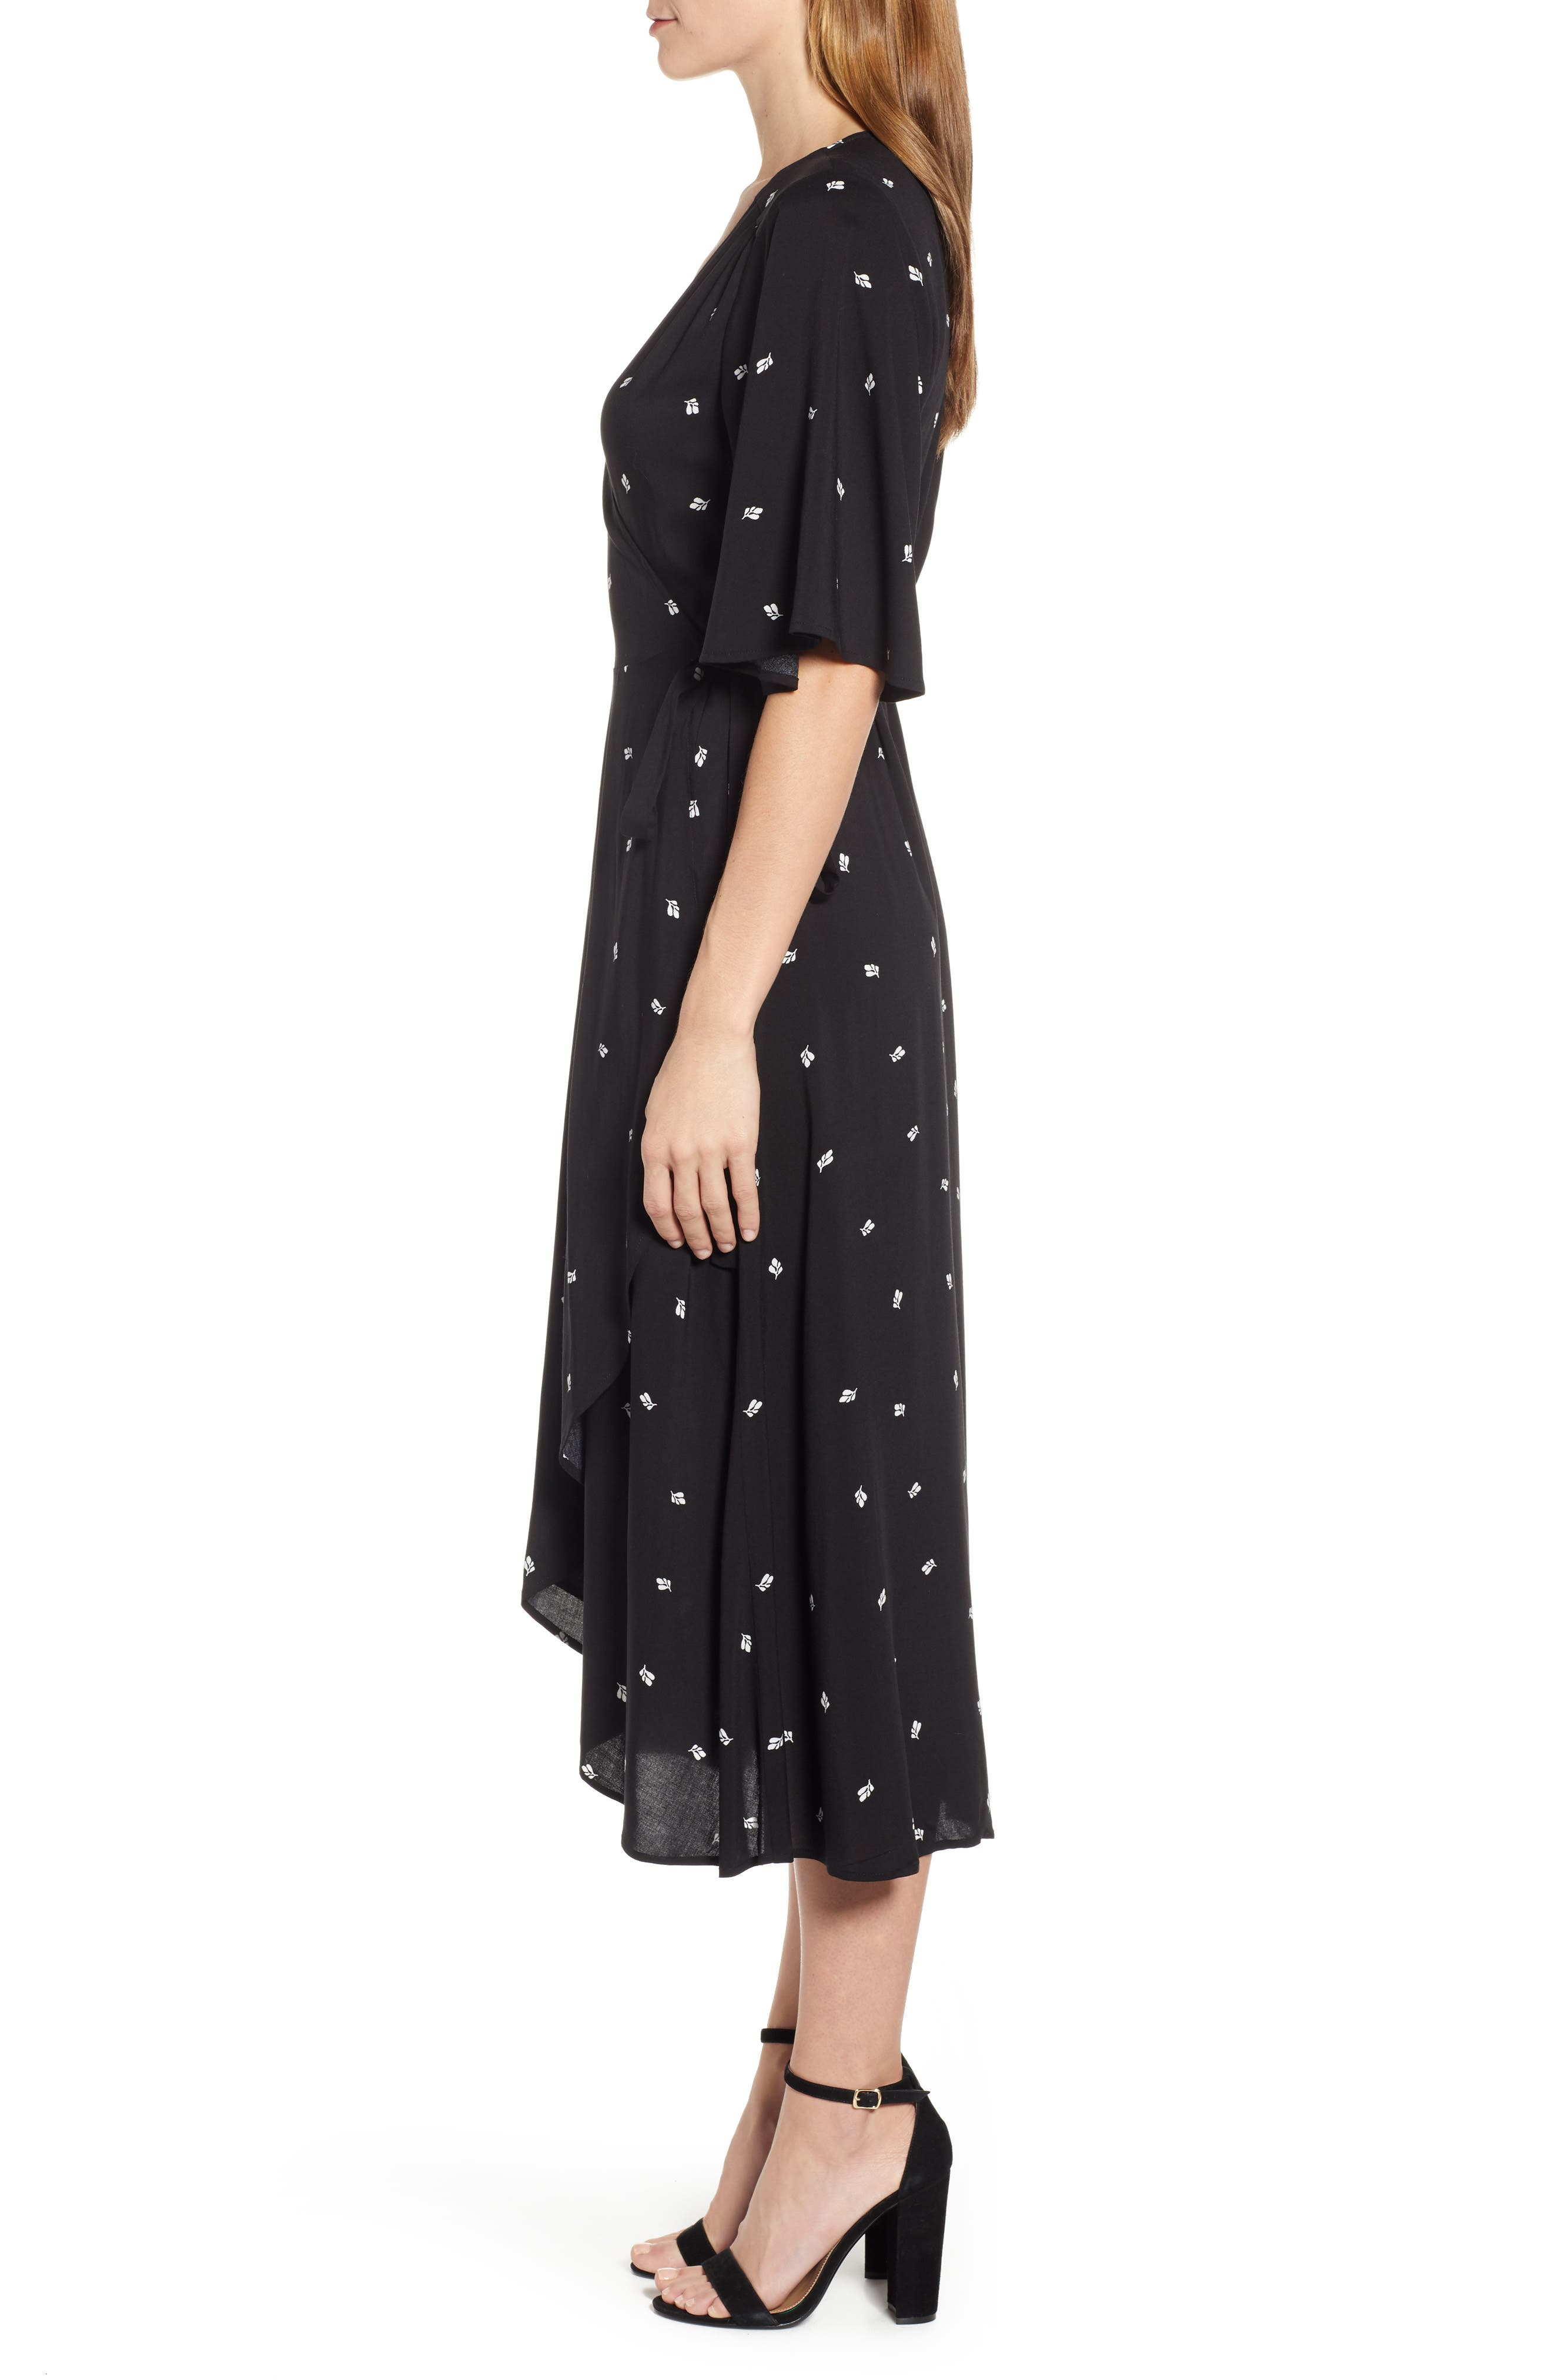 BOBEAU, Orna High/Low Wrap Dress, Alternate thumbnail 4, color, BLACK LEAF PRINT